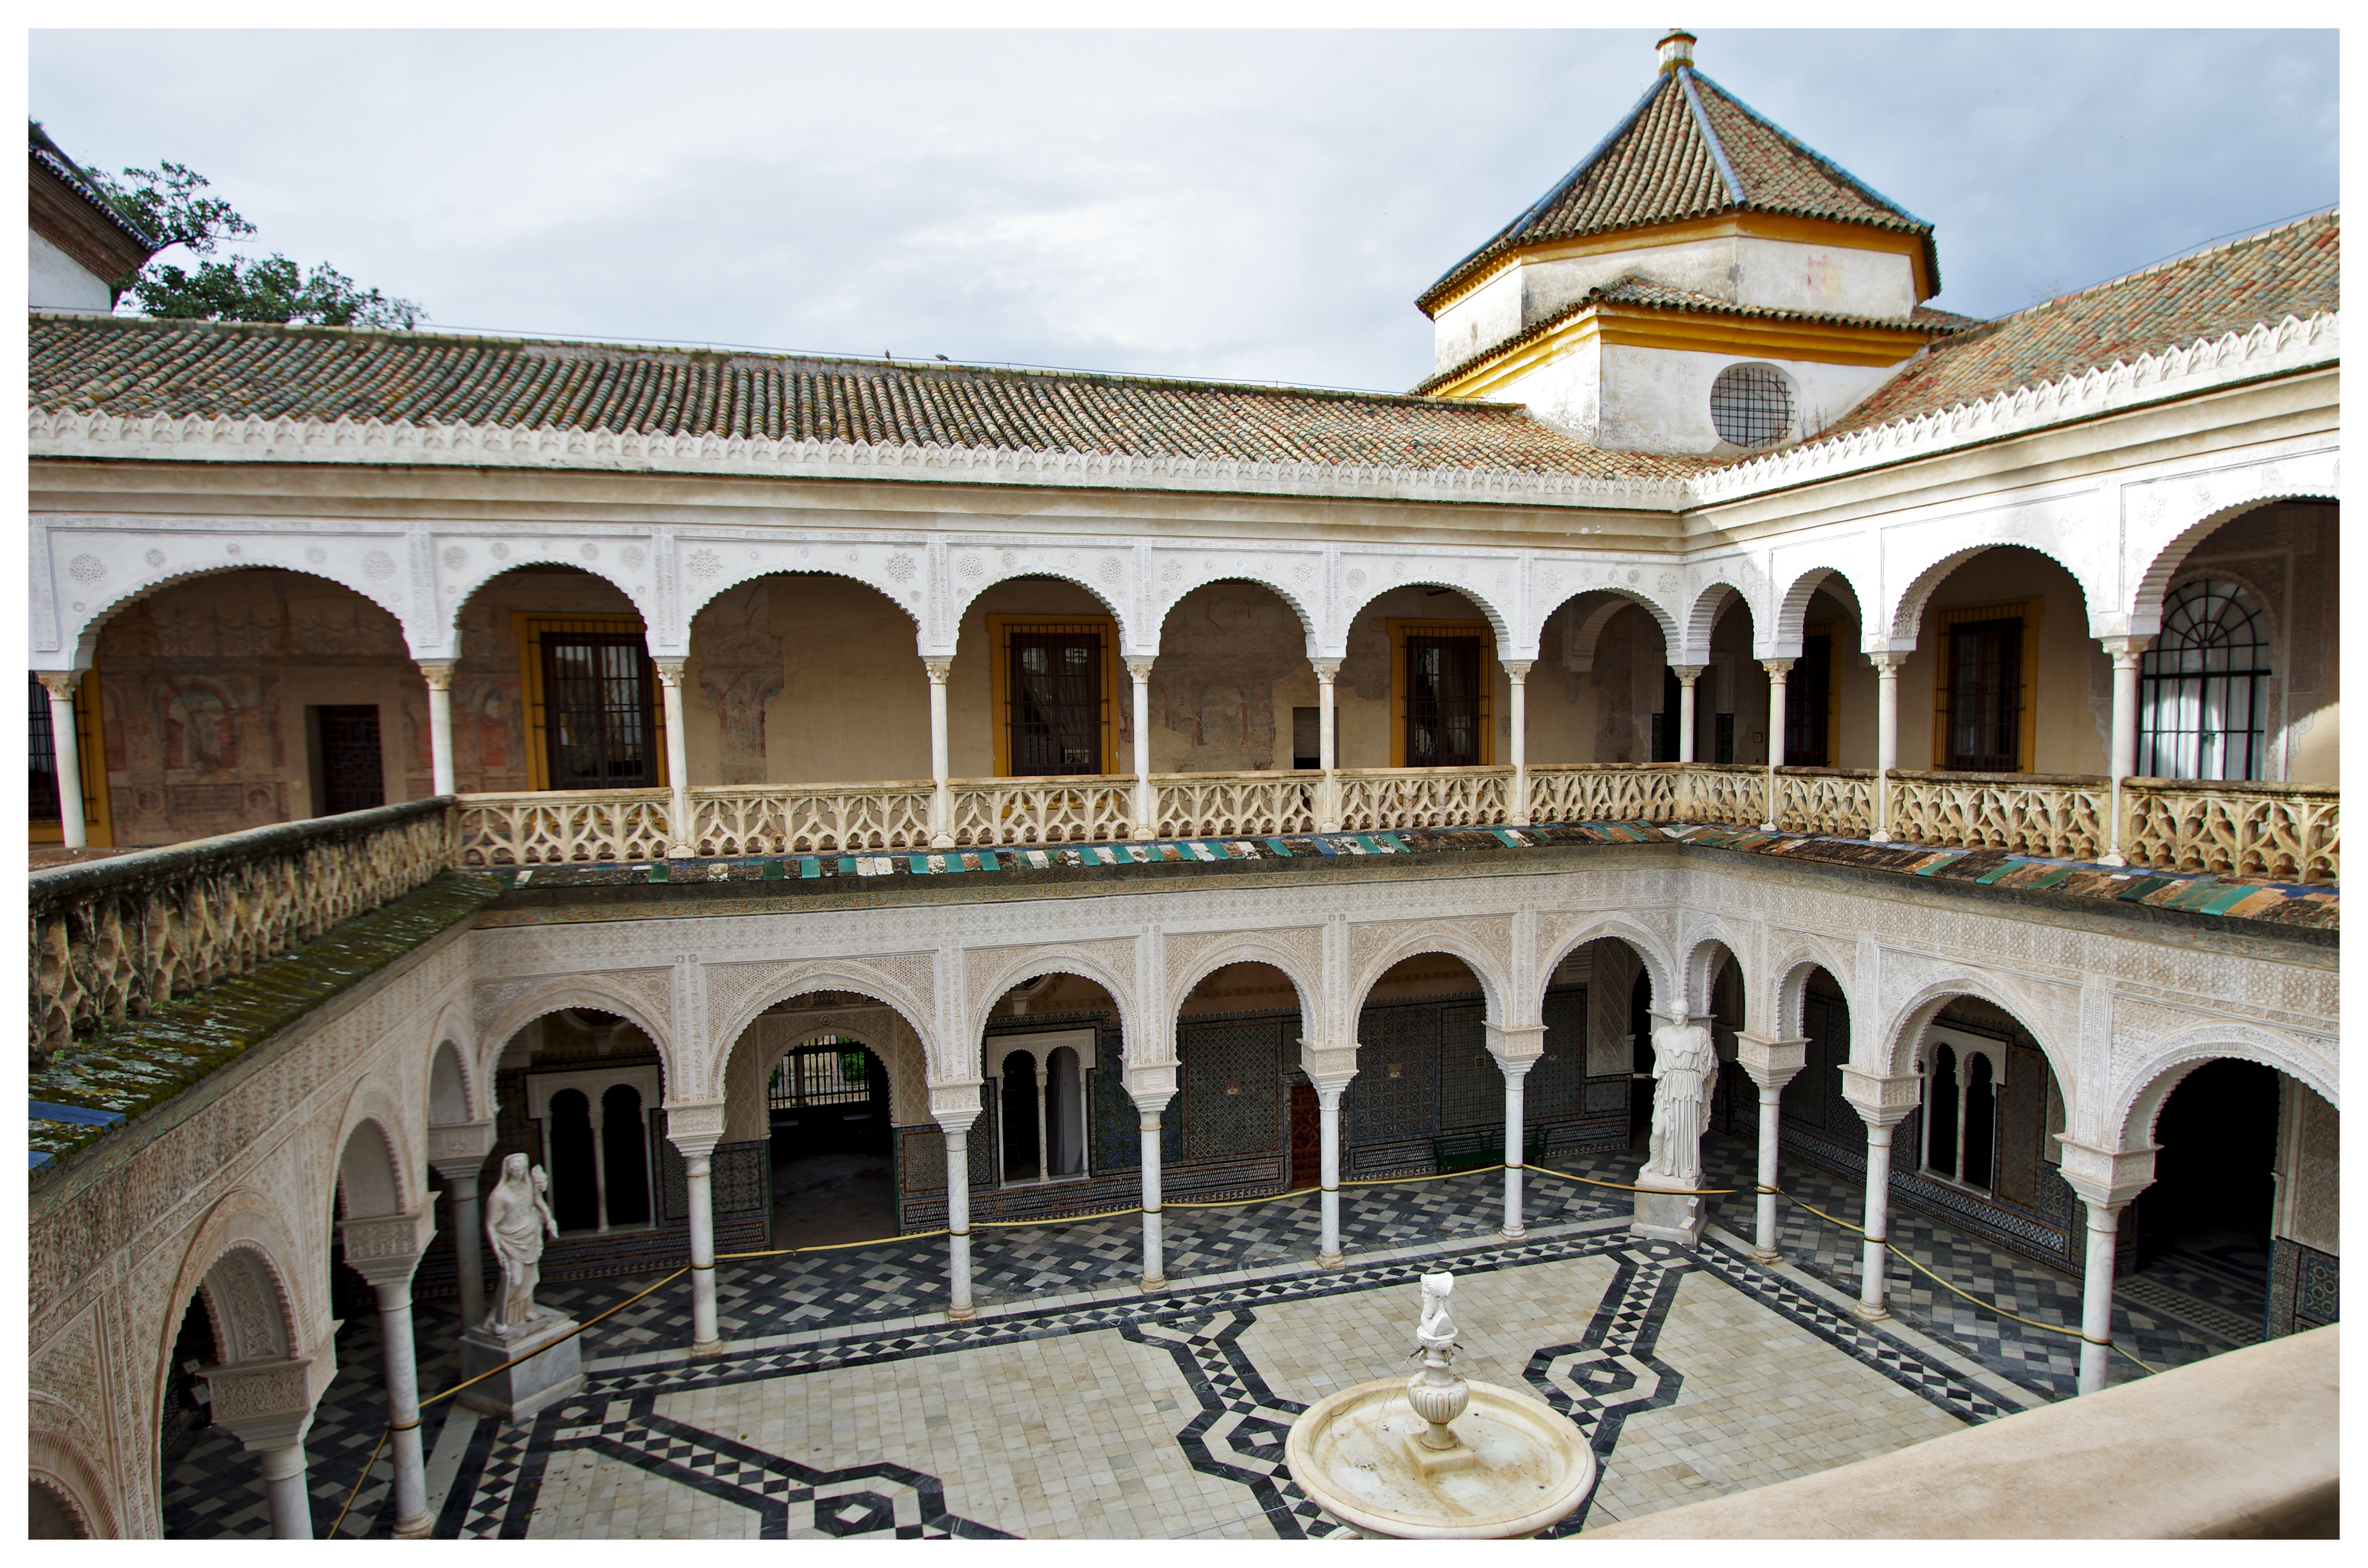 File:Casa de Pilatos-Sevilla.jpg - Wikimedia Commons